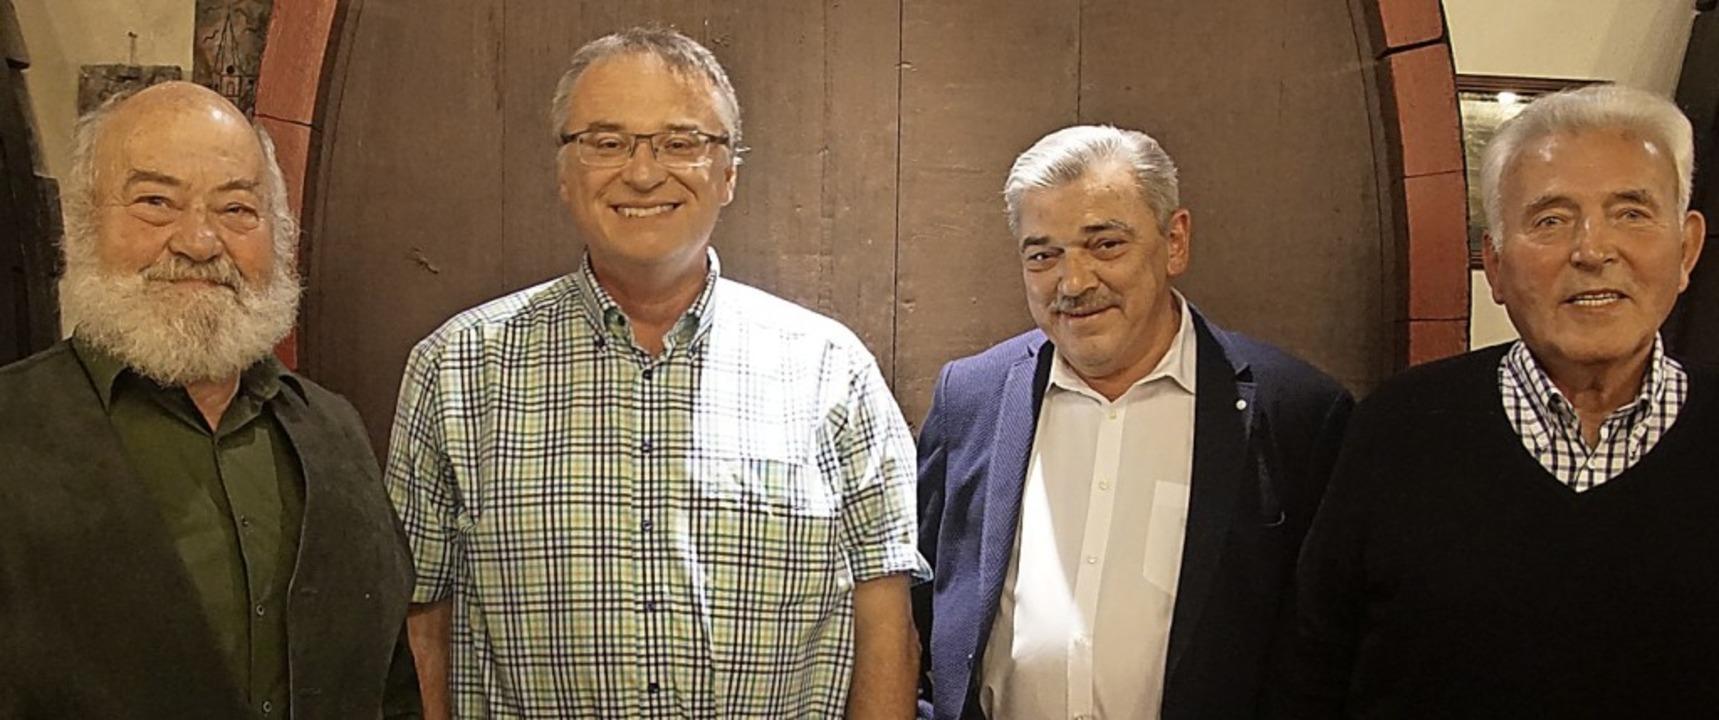 Ehrungen beim CDU-Stadtverband  Ending...el Hug, Bernd Adler und Franz Lederle.  | Foto: Ilona Huege